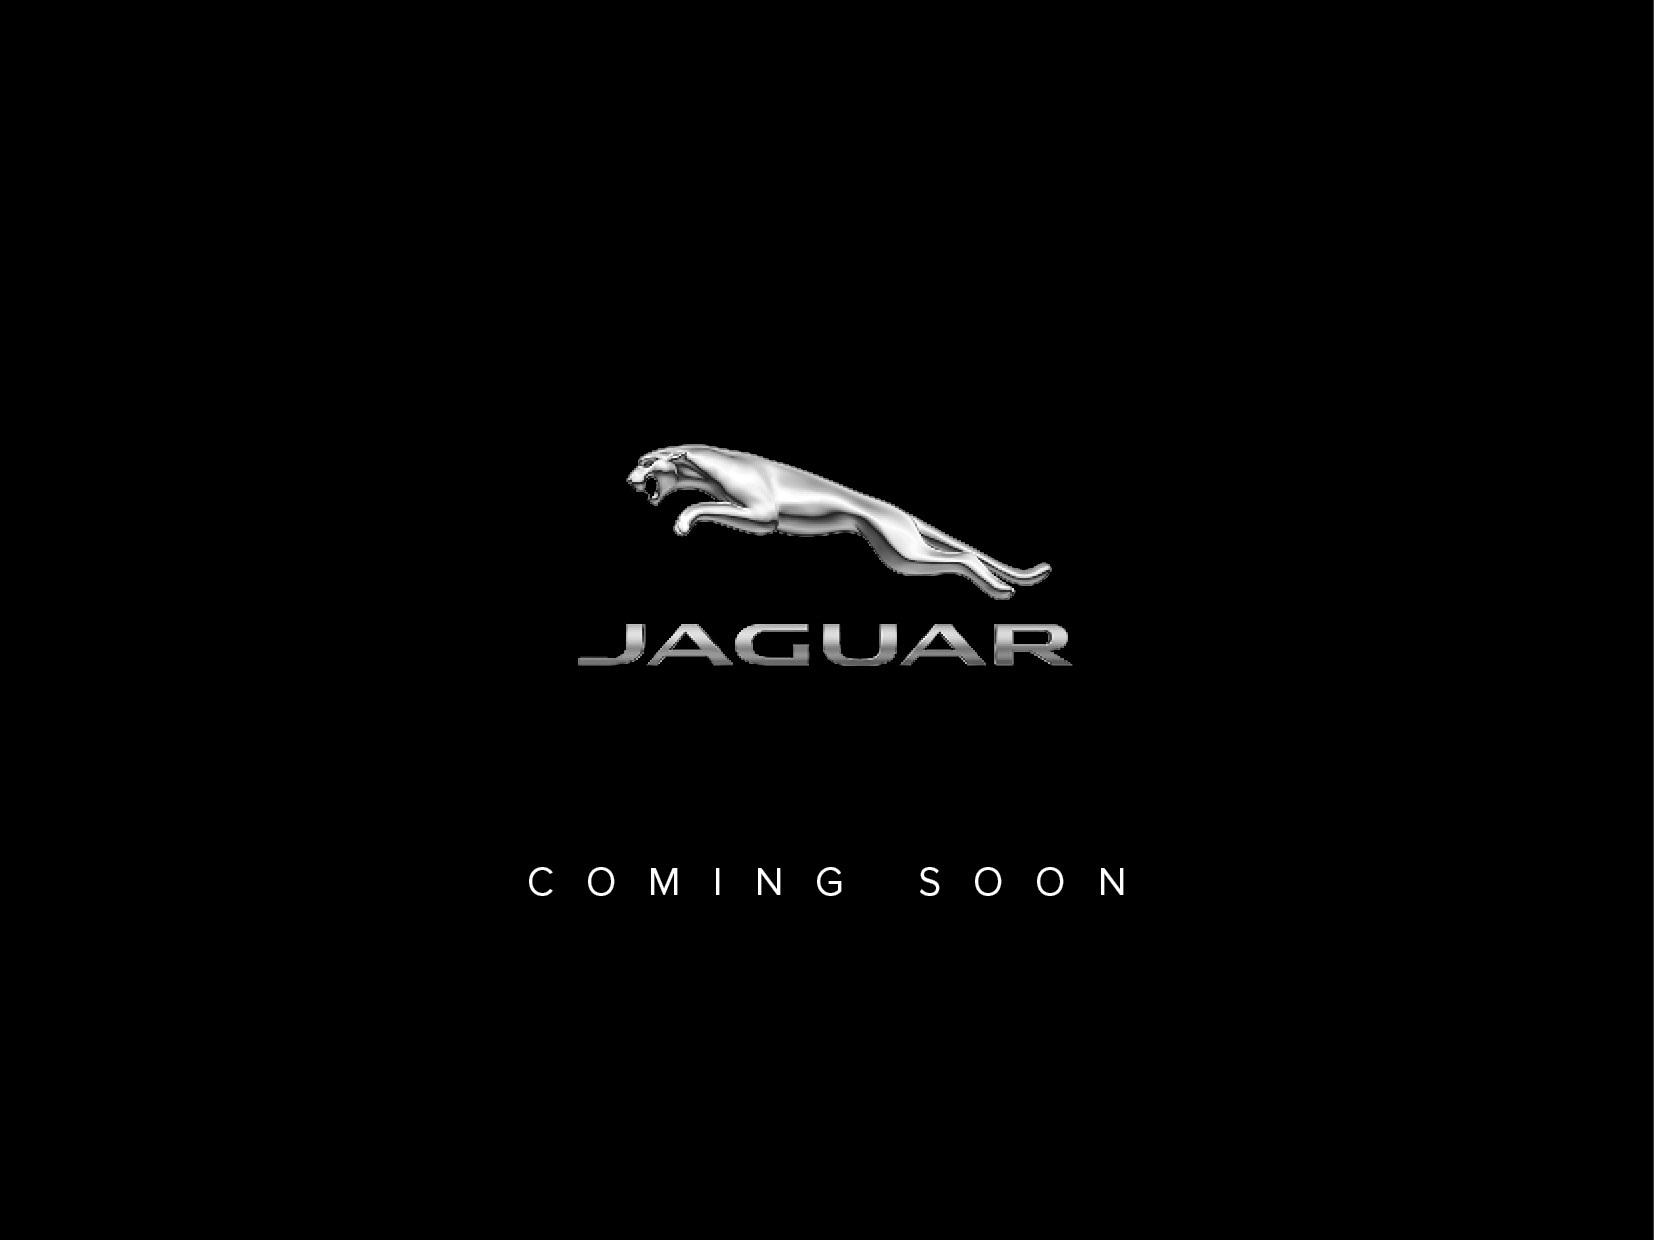 Jaguar F-PACE 3.0 Supercharged V6 S 5dr AWD Automatic 4 door Estate (2017) image